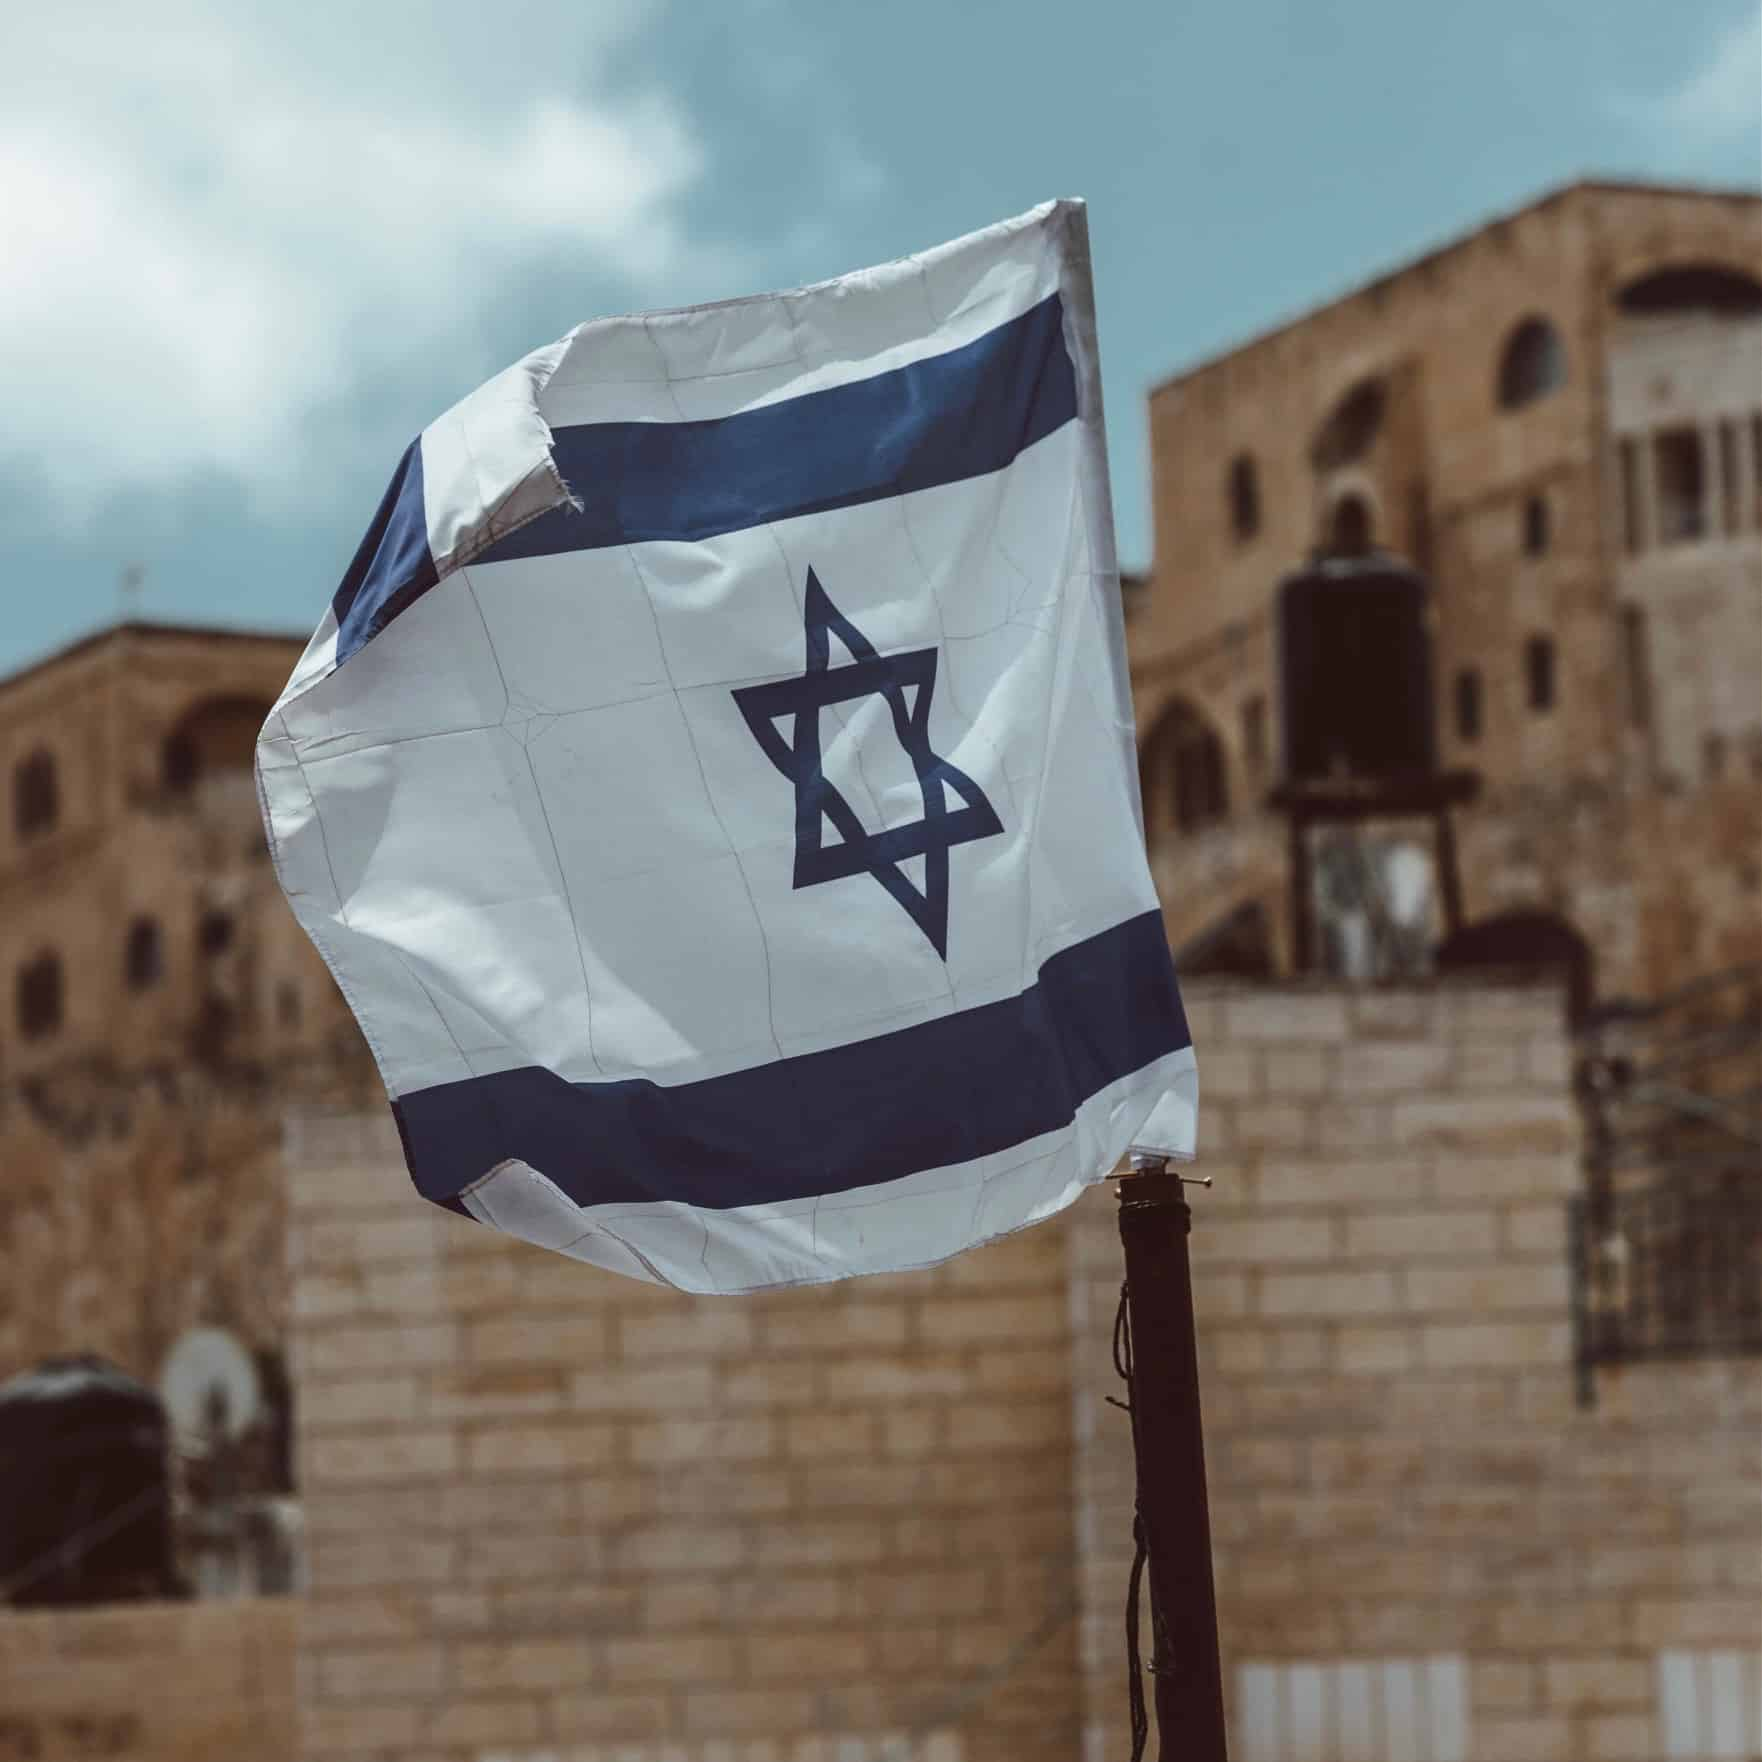 Erikoisohjelma Jerusalem studio special lauantaina klo 21.15